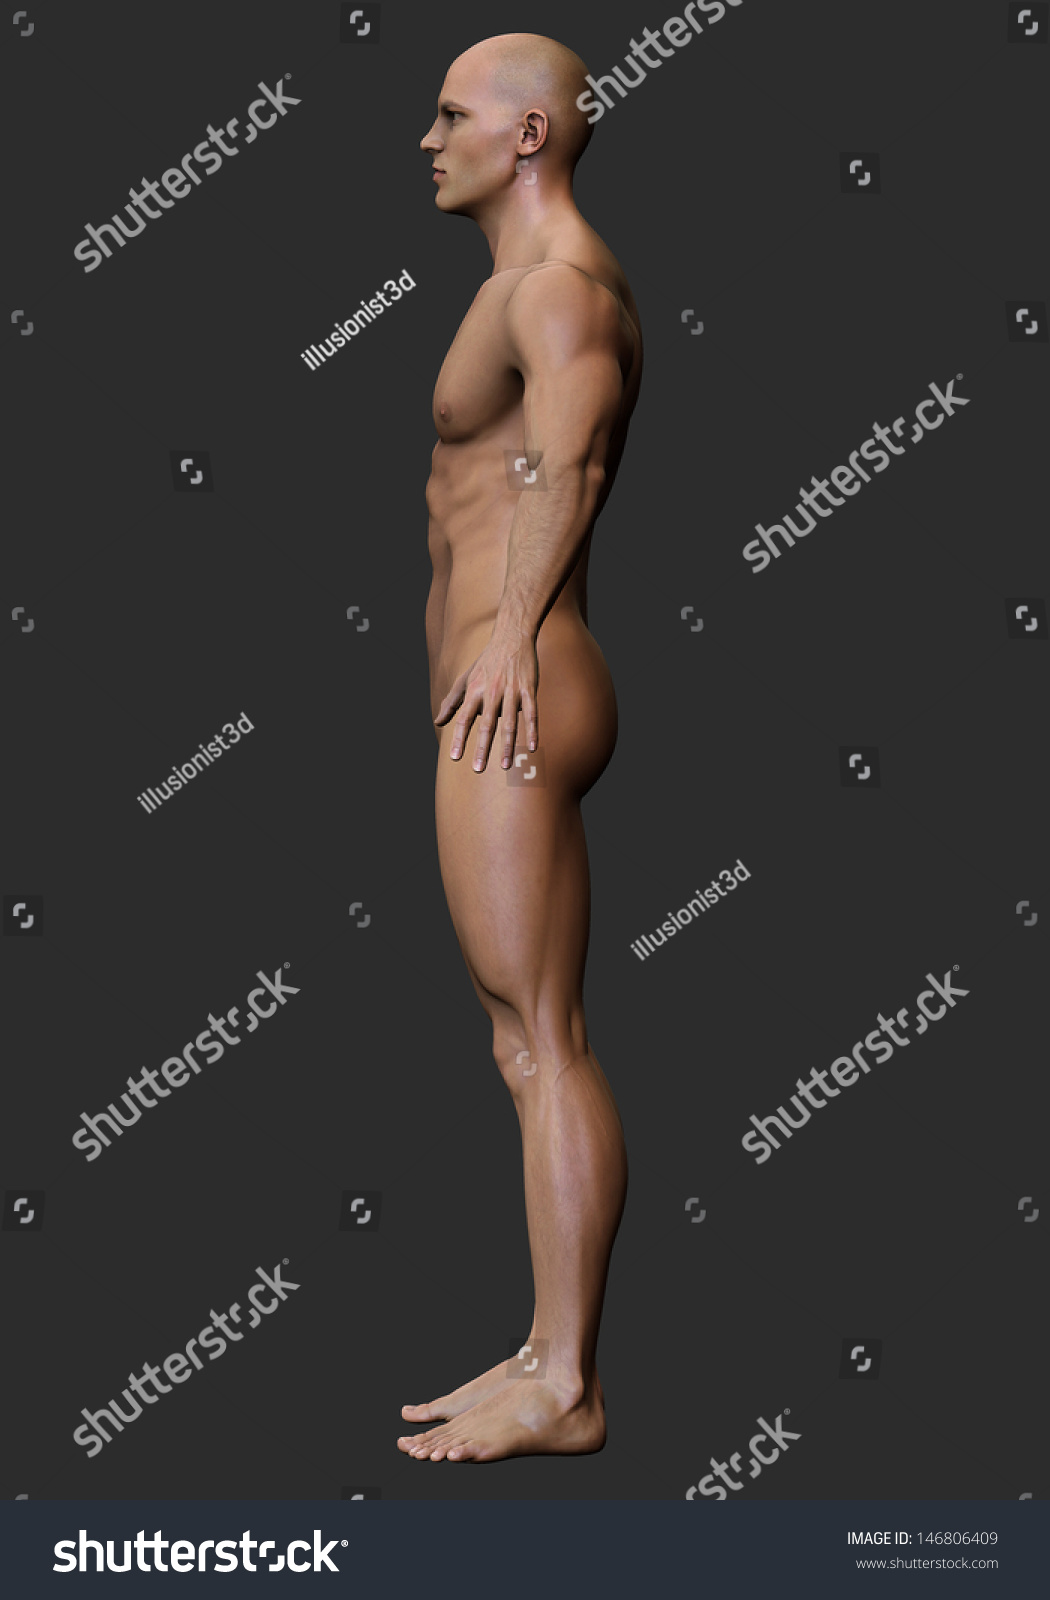 3d male body anatomy naked stock illustration 146806409 - shutterstock